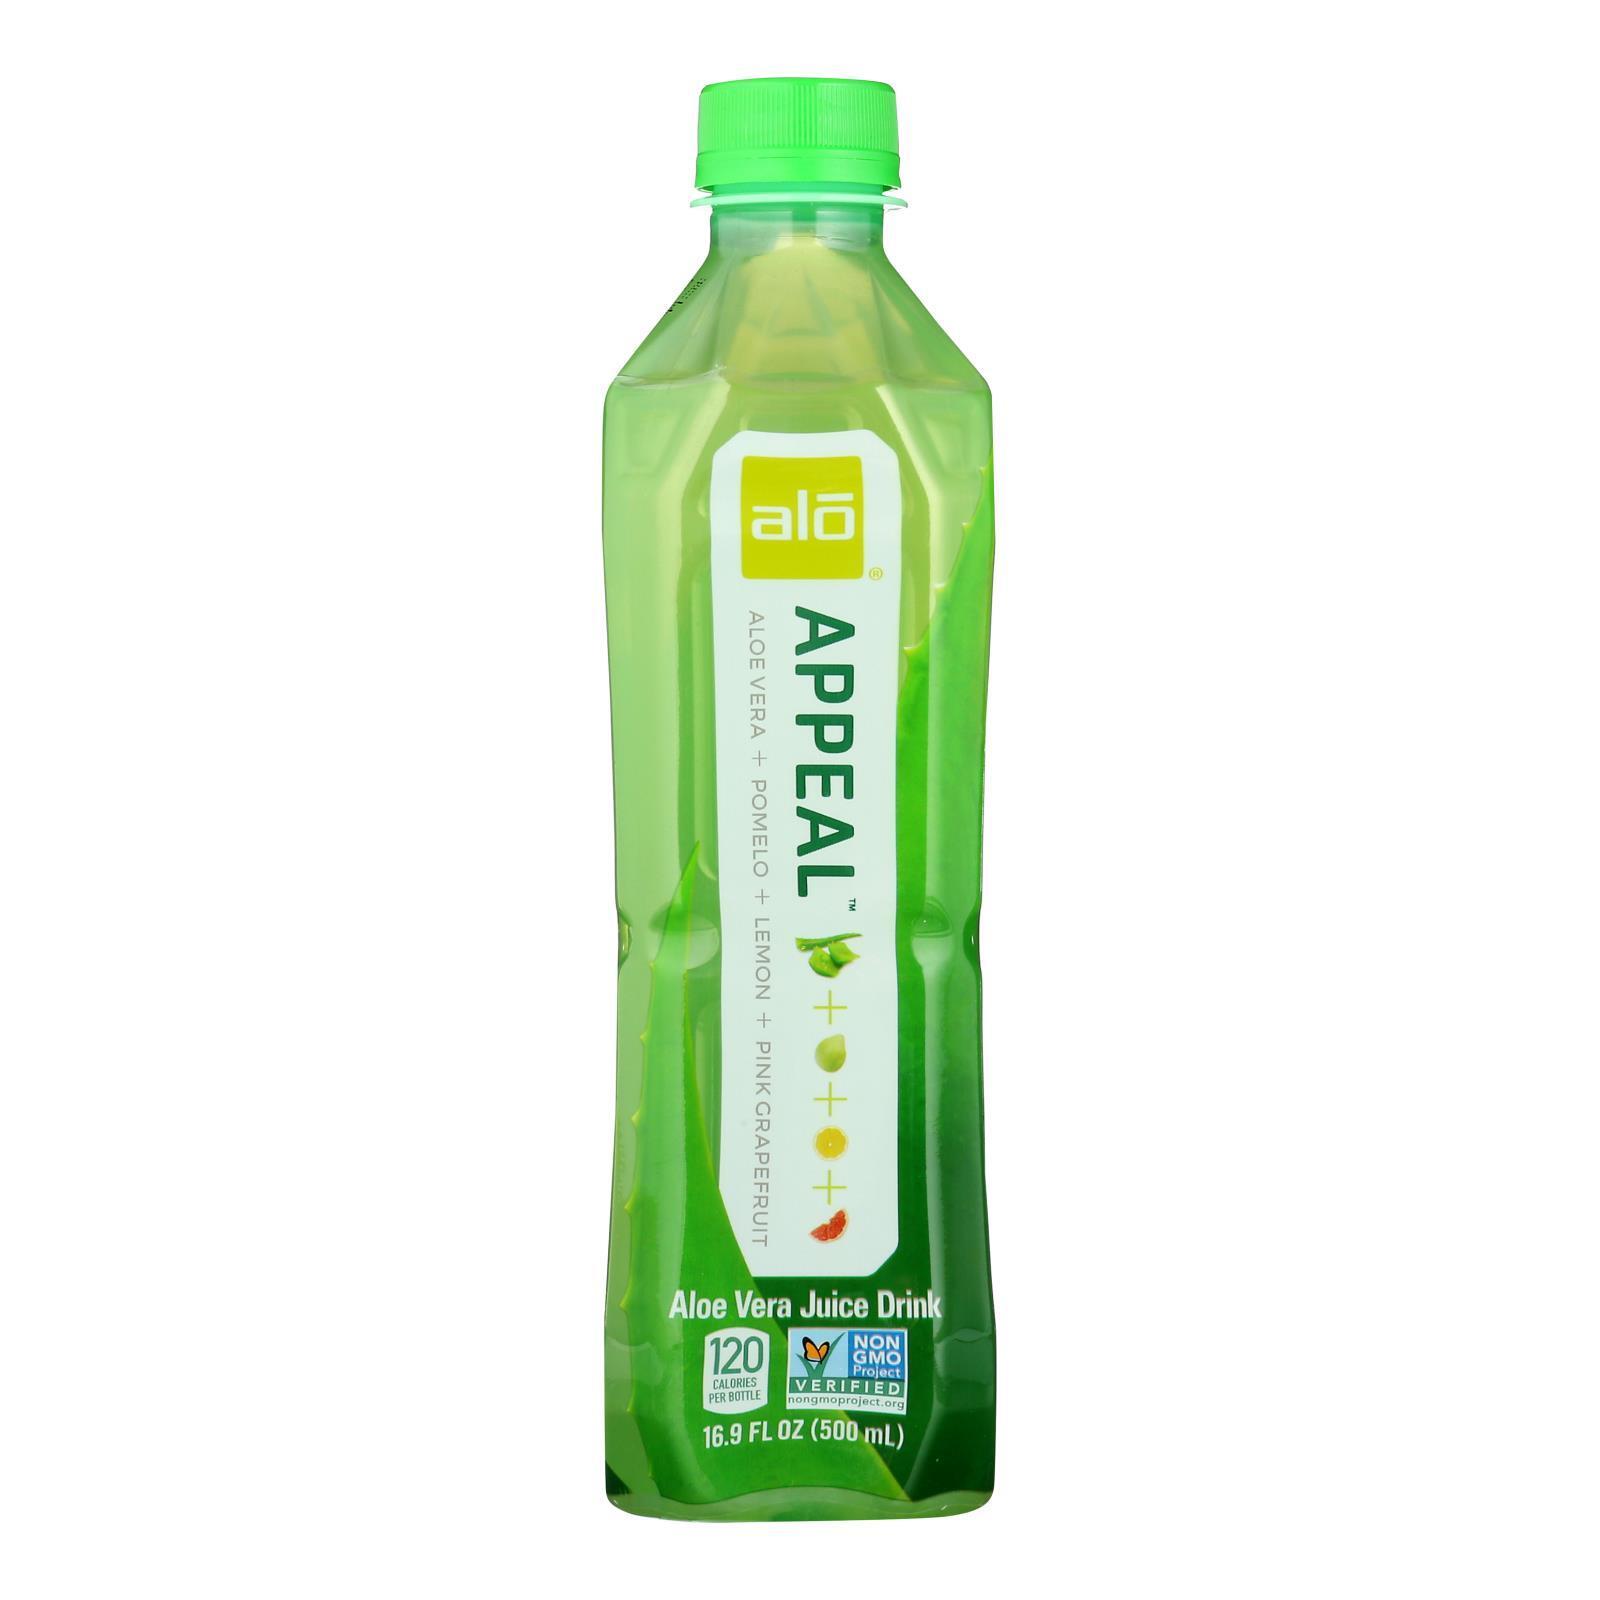 Alo Original Appeal Aloe Vera Juice Drink - Pomelo, Lemon and Pink Grapefruit - Case of 12 - 16.9 fl oz.